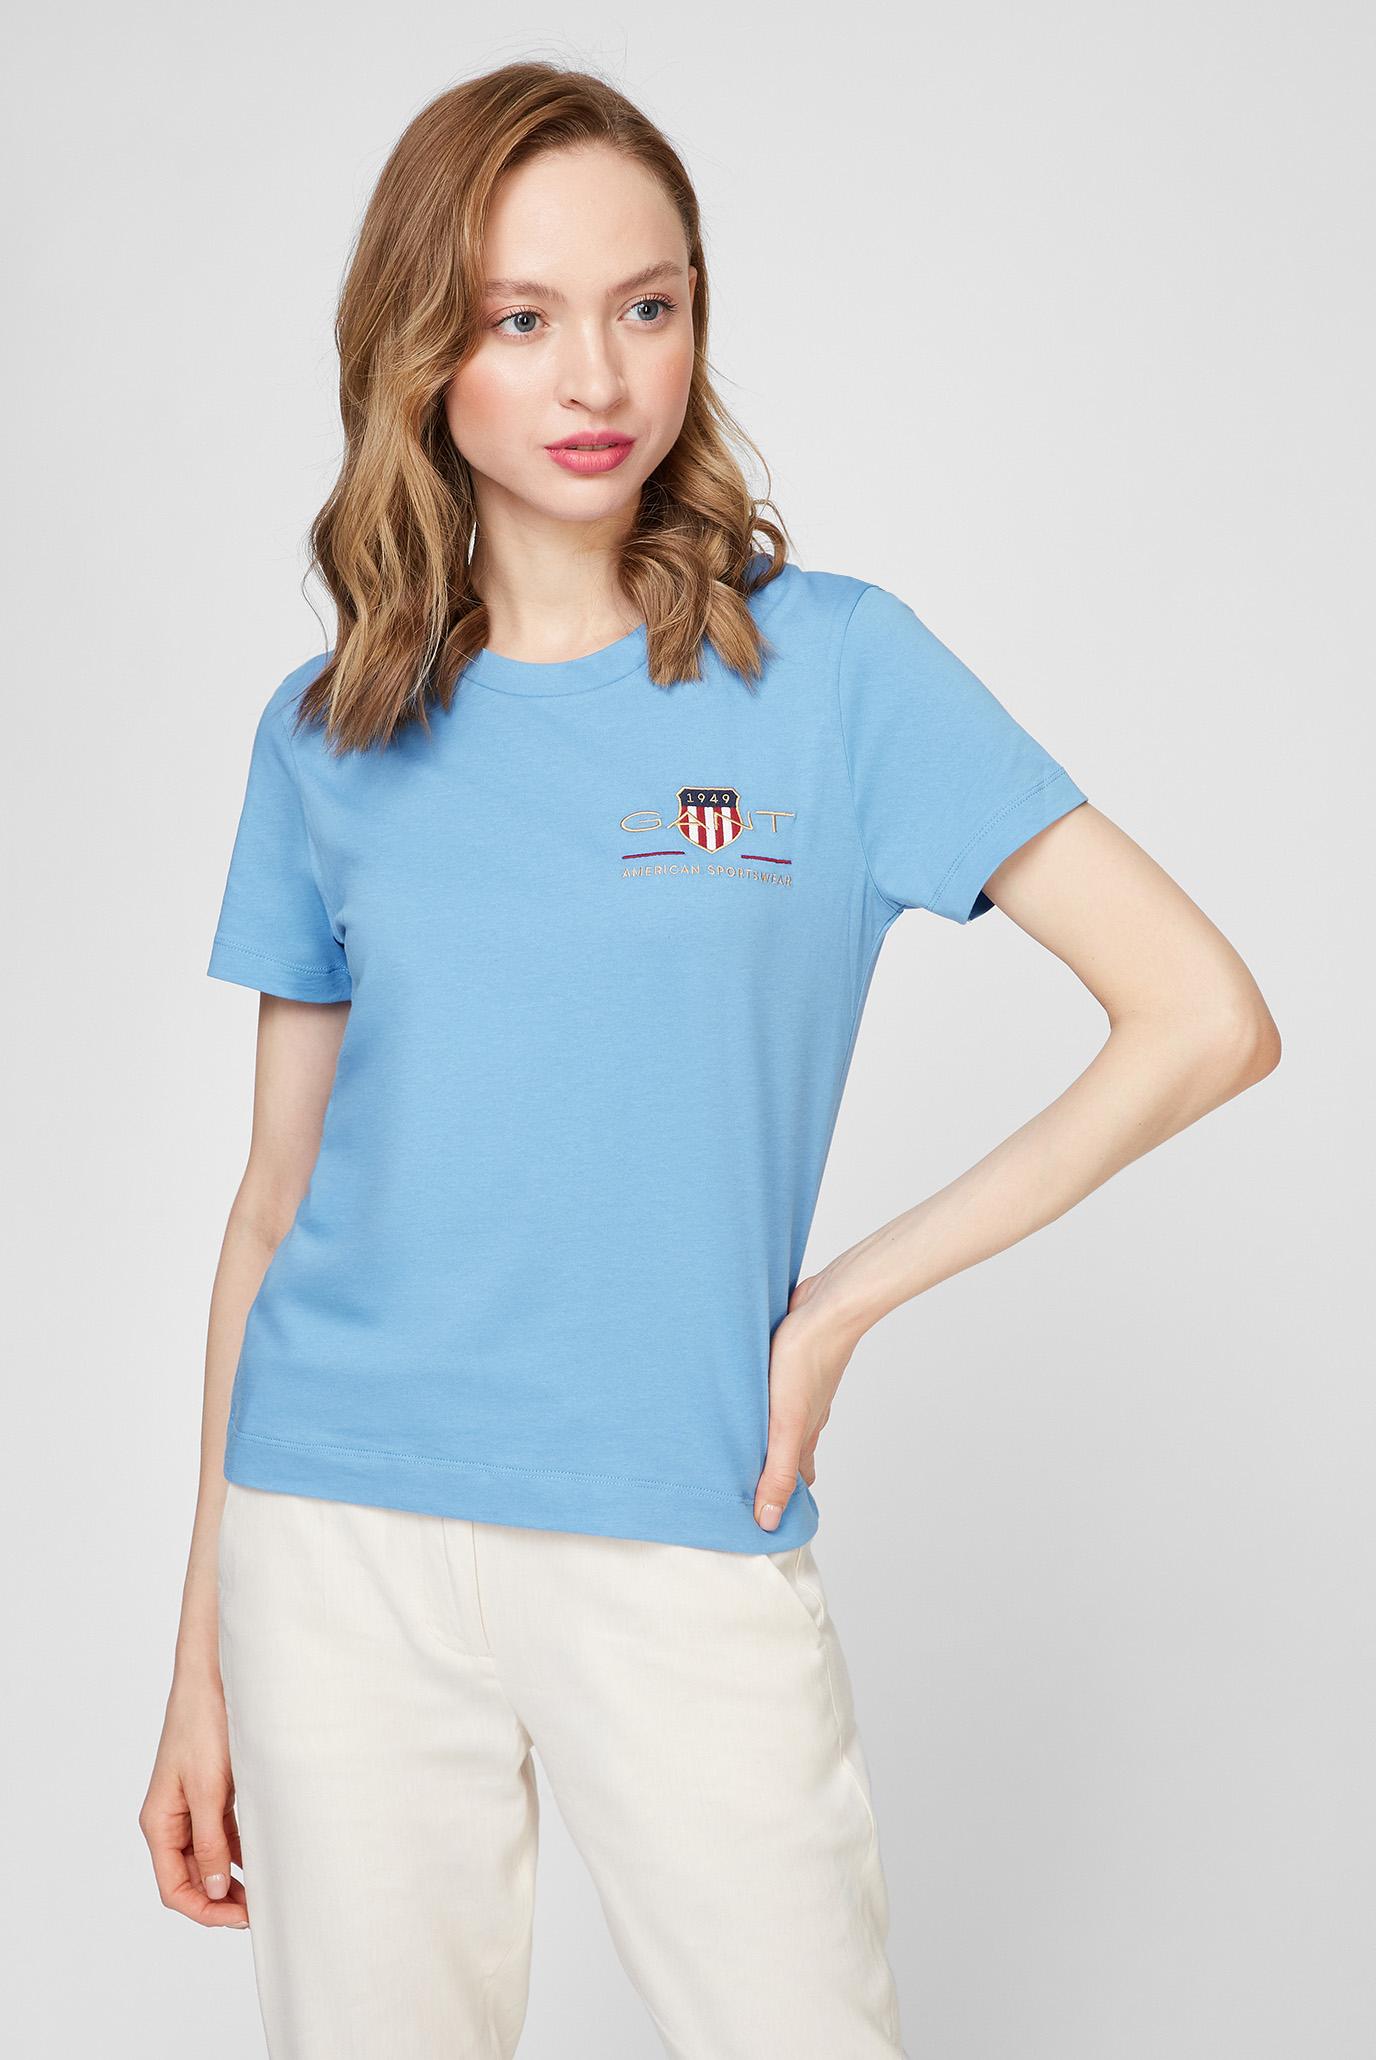 Женская голубая футболка ARCHIVE SHIELD SS 1